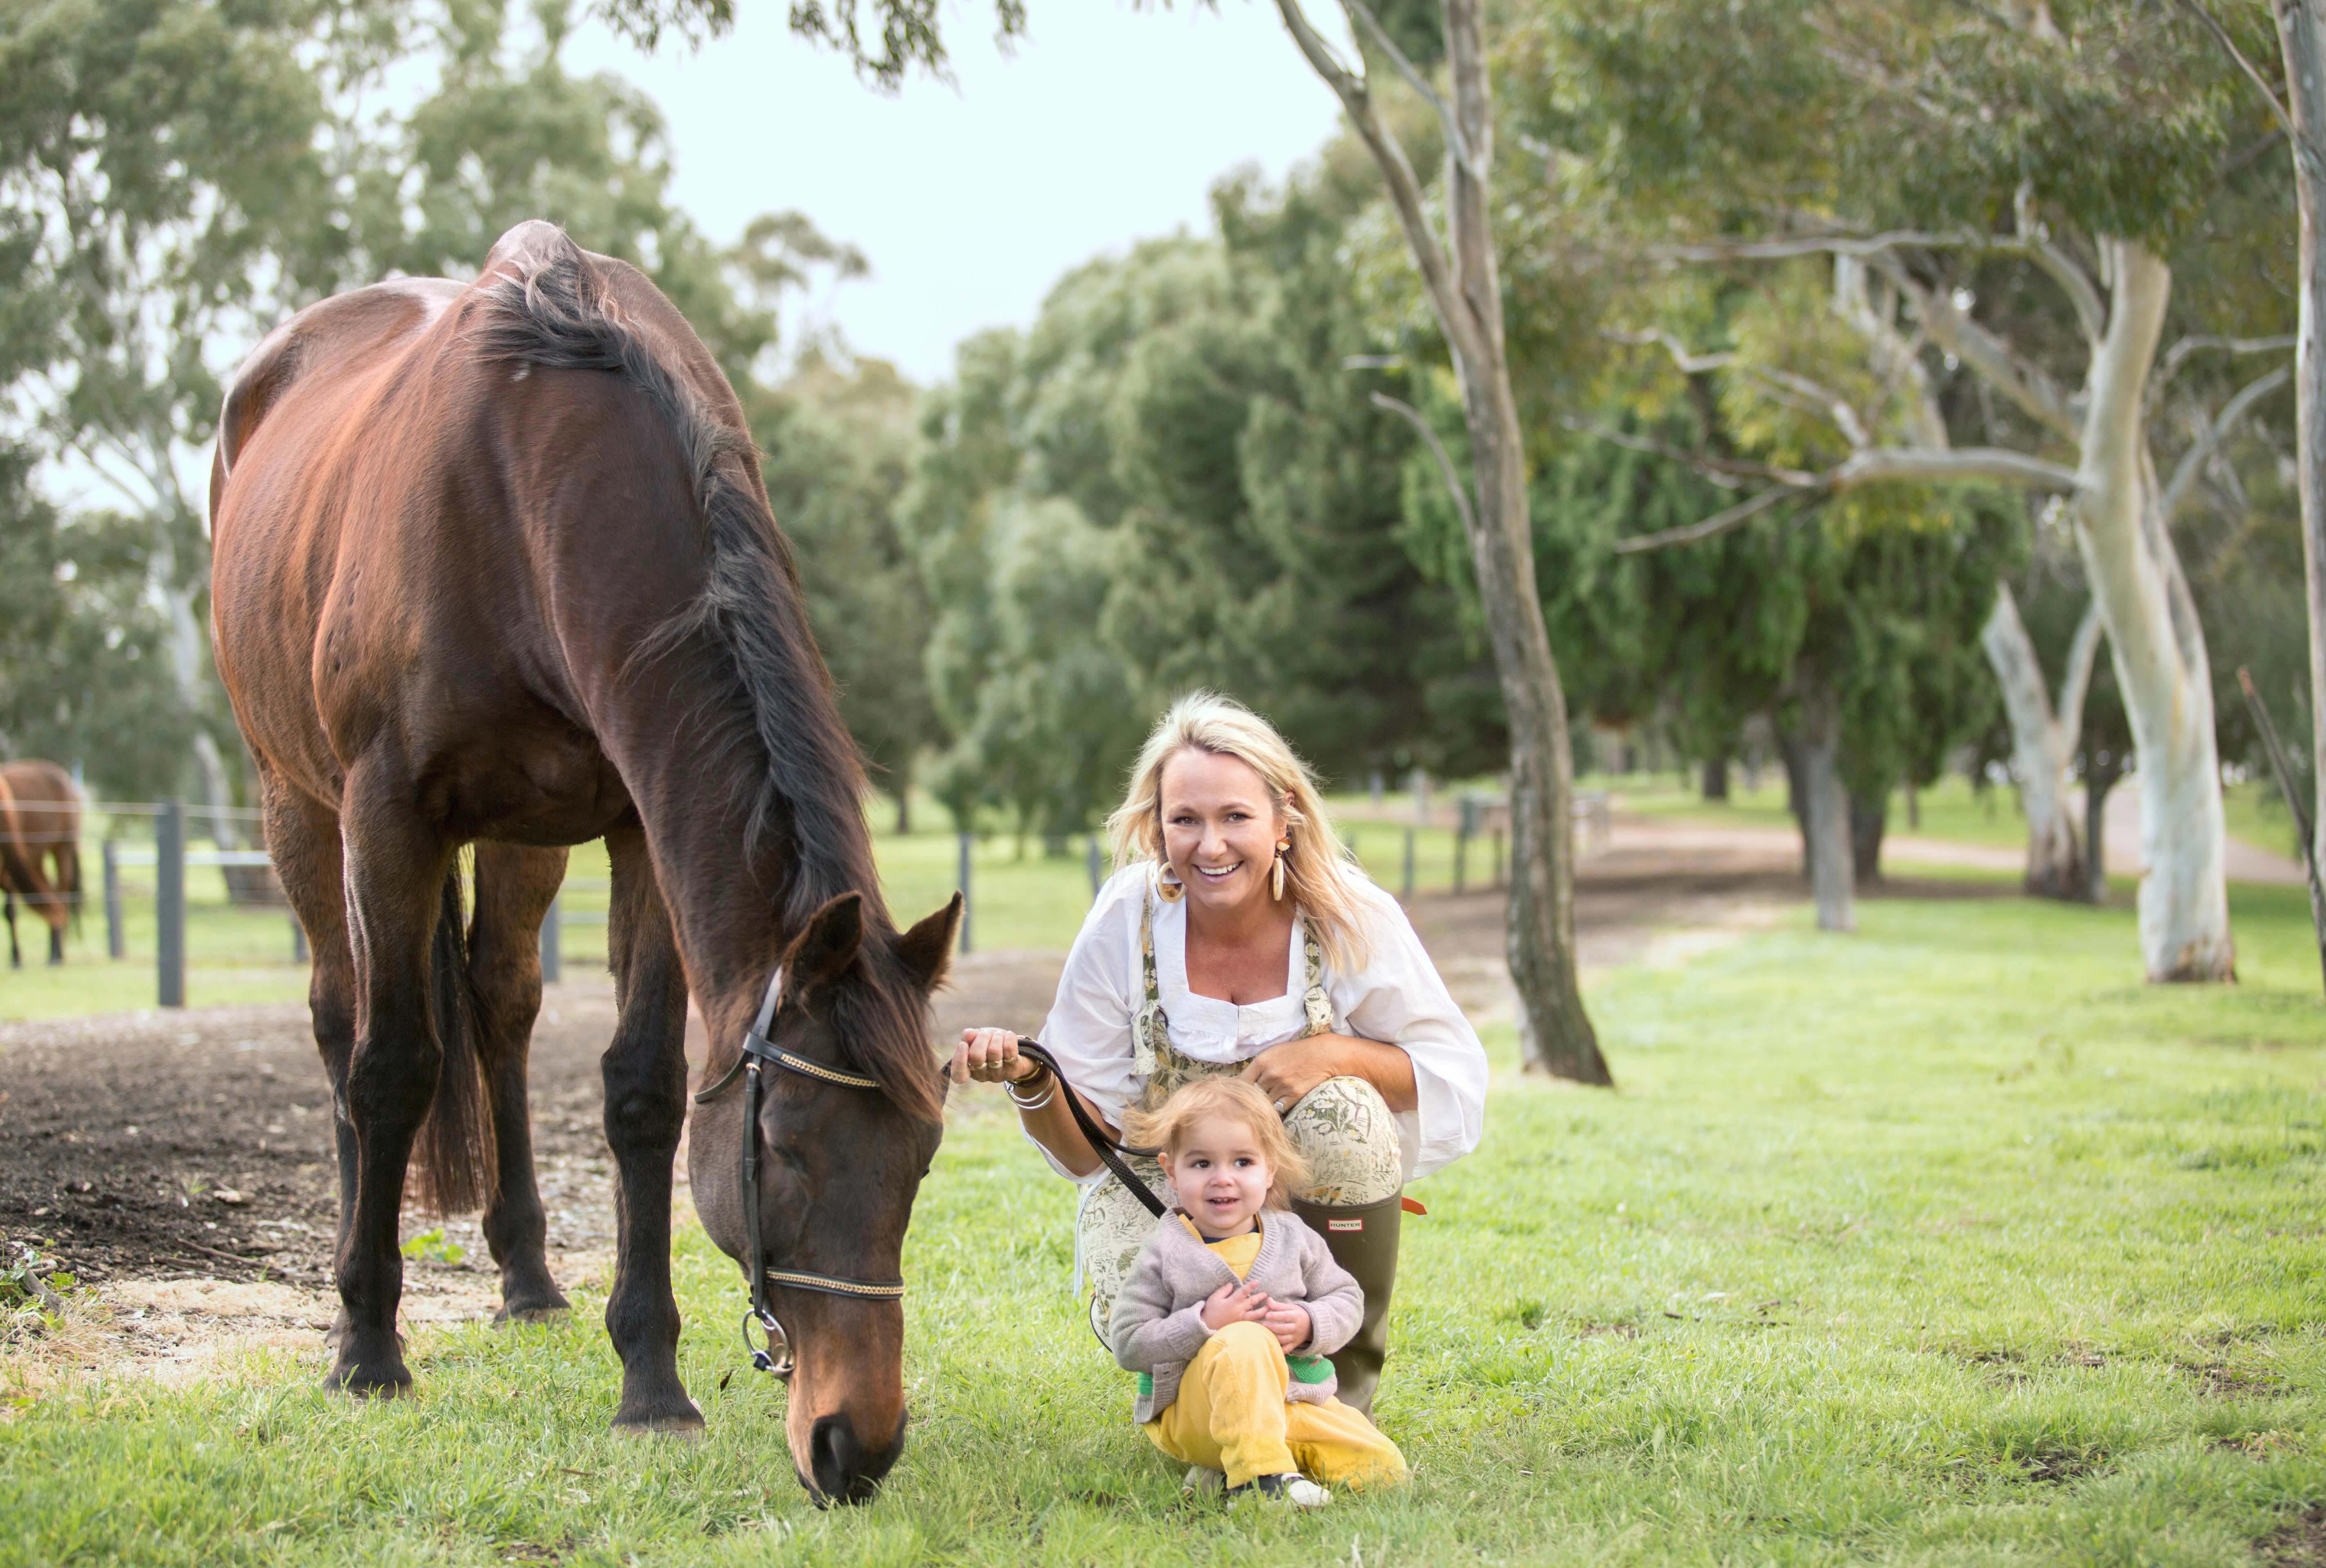 Fashion and Motherhood Go Hand-in-Hand For South Australian Designer BinnyWatson